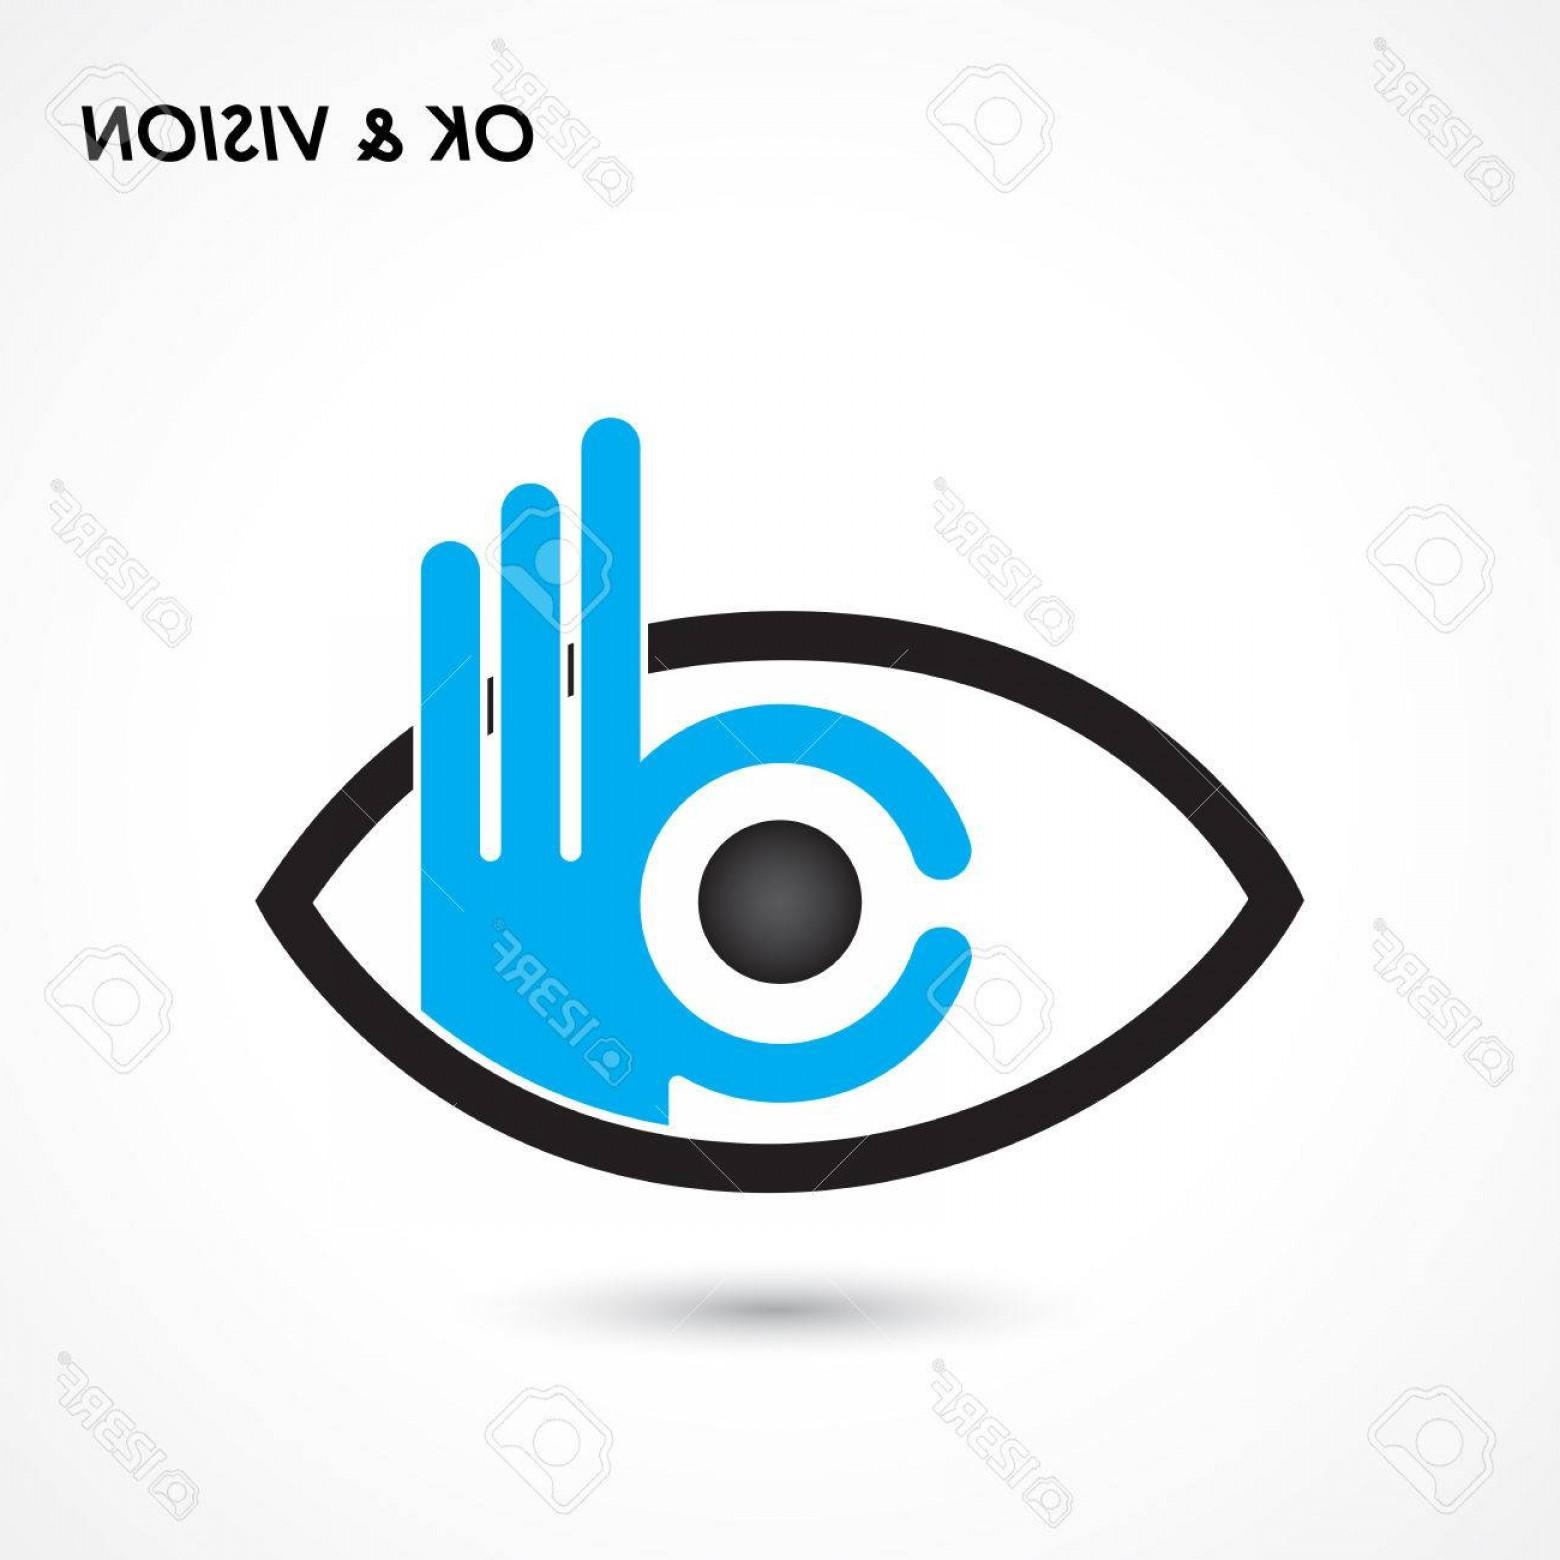 1560x1560 World Vision Logo Vector Geekchicpro